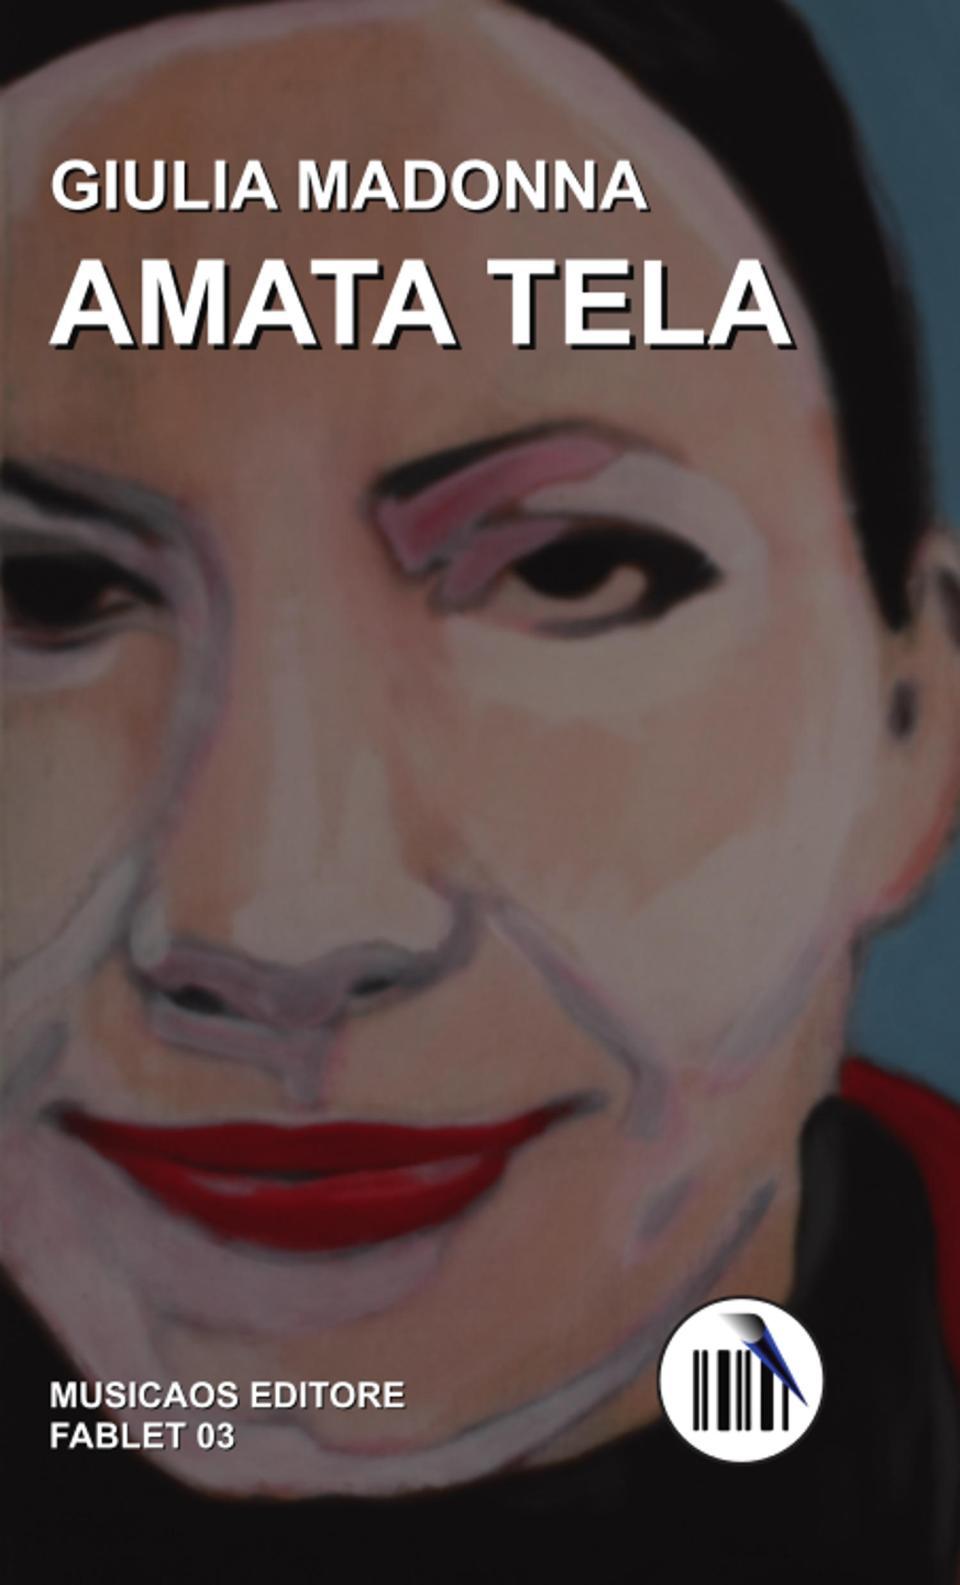 GiuliaMadonna-Amatatela-musicaoseditore-fablet03